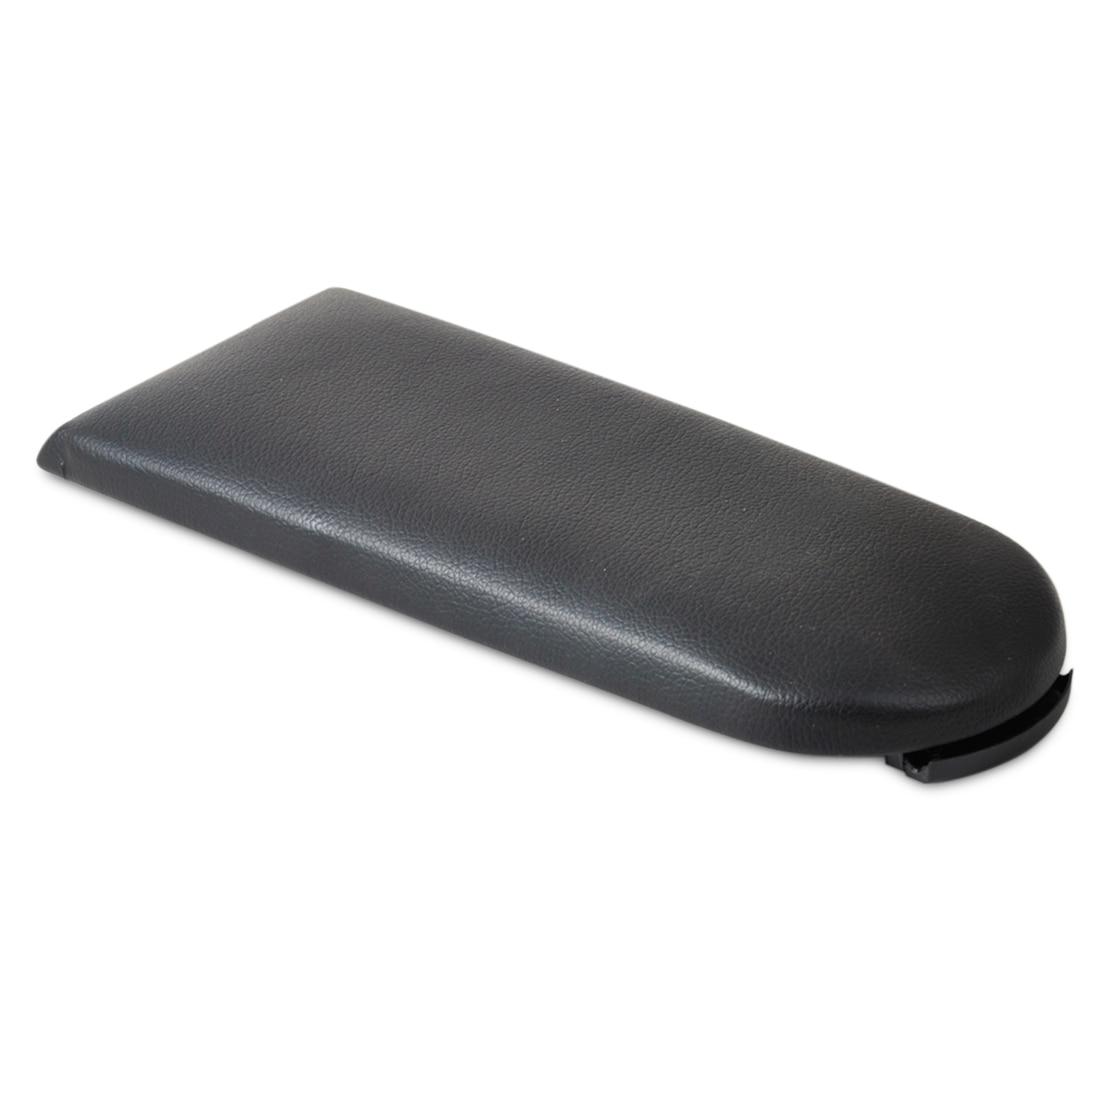 beler Car Accessories Black Leather Center Console Armrest <font><b>Cover</b></font> Lid For VW Jetta Golf MK4 Beetle Bora Passat B5 Skoda Octavia